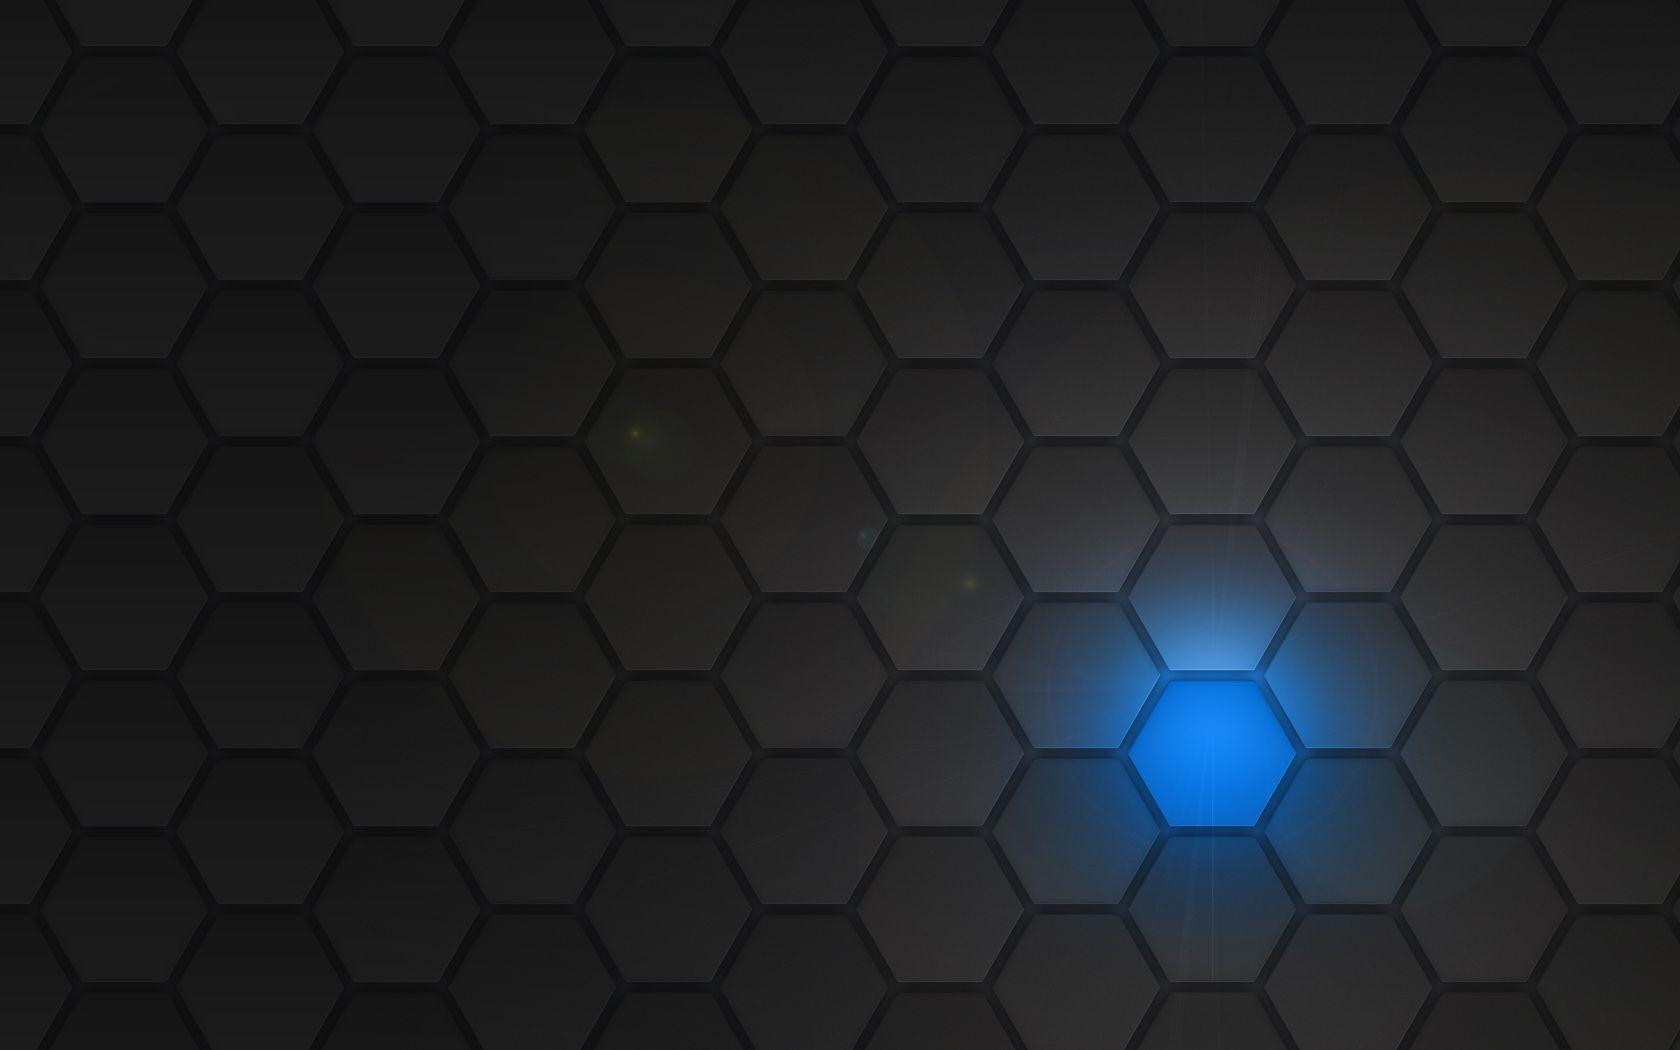 Simple Desktop Backgrounds Wallpaper Cave